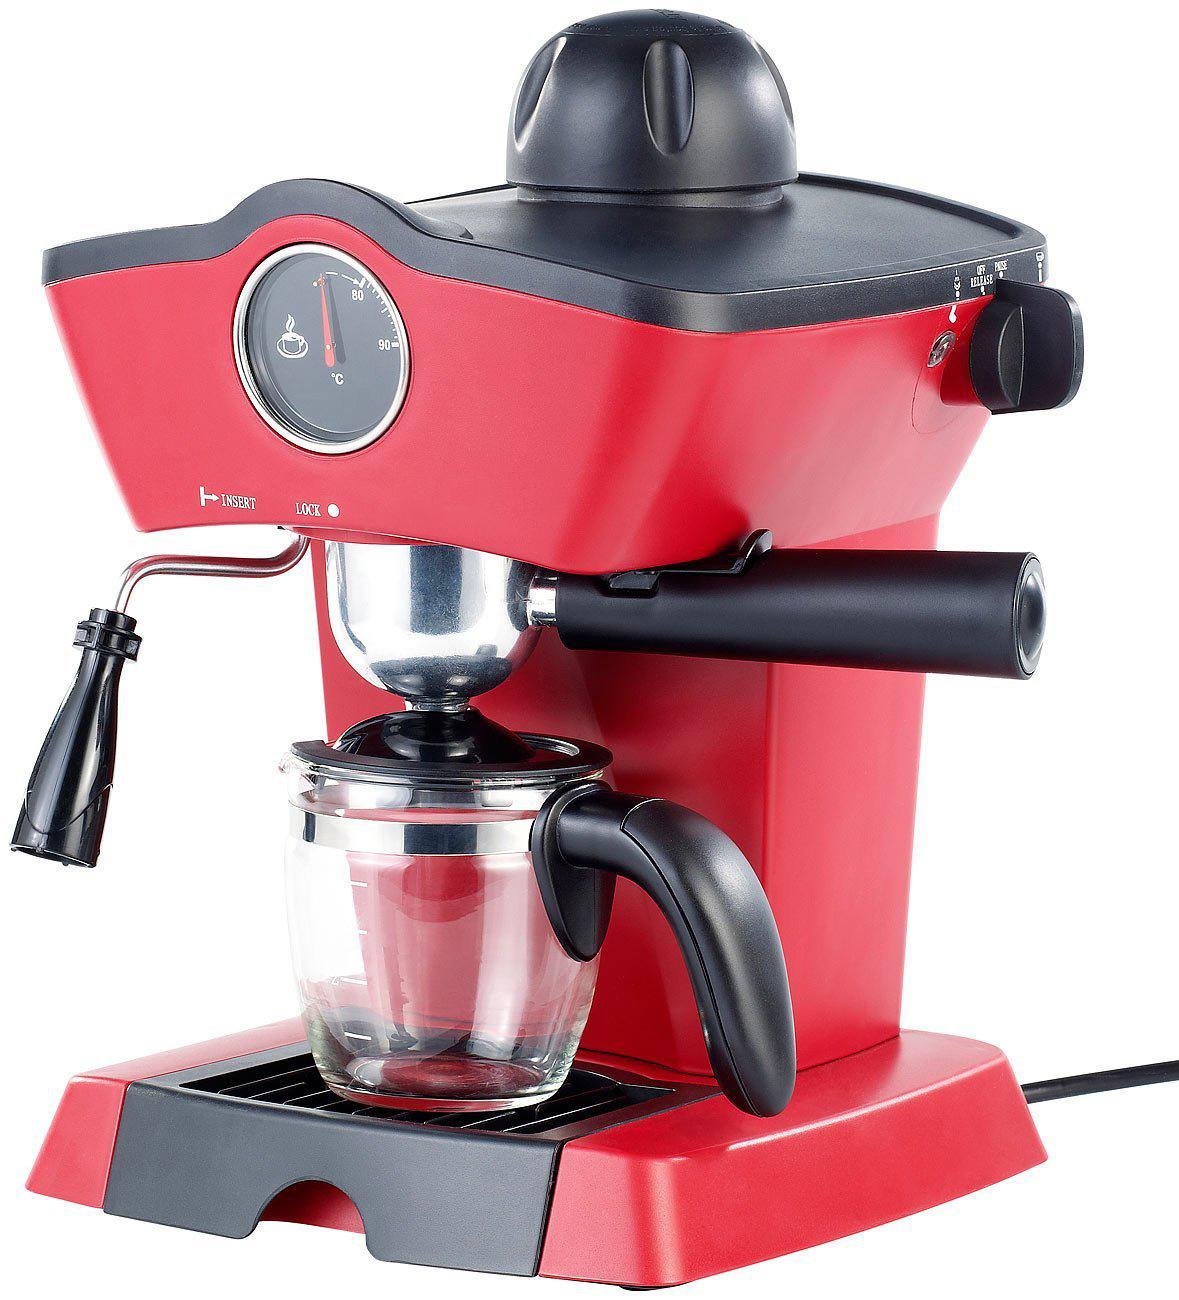 Espressomaschine Deluxe